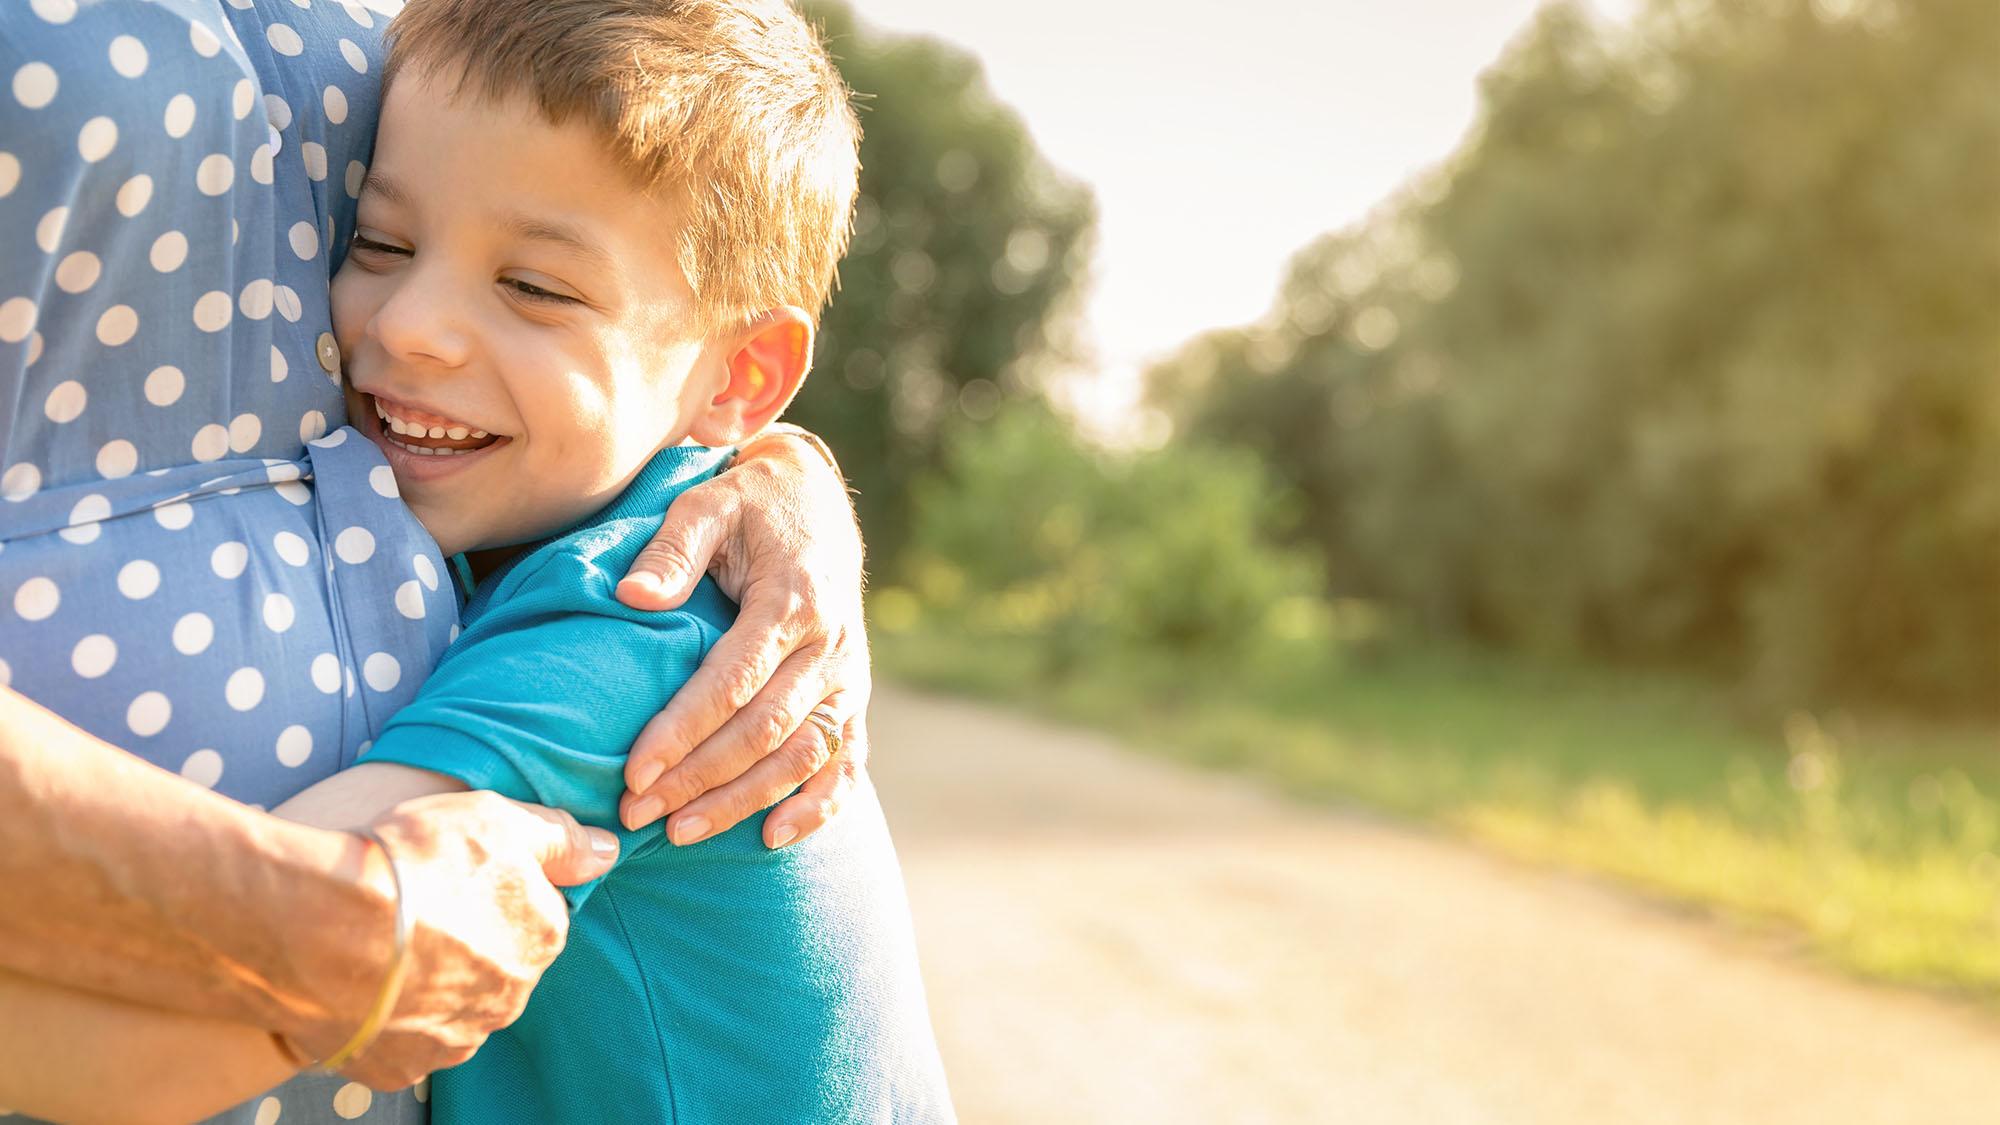 Grandparents are key to happy grandchildren